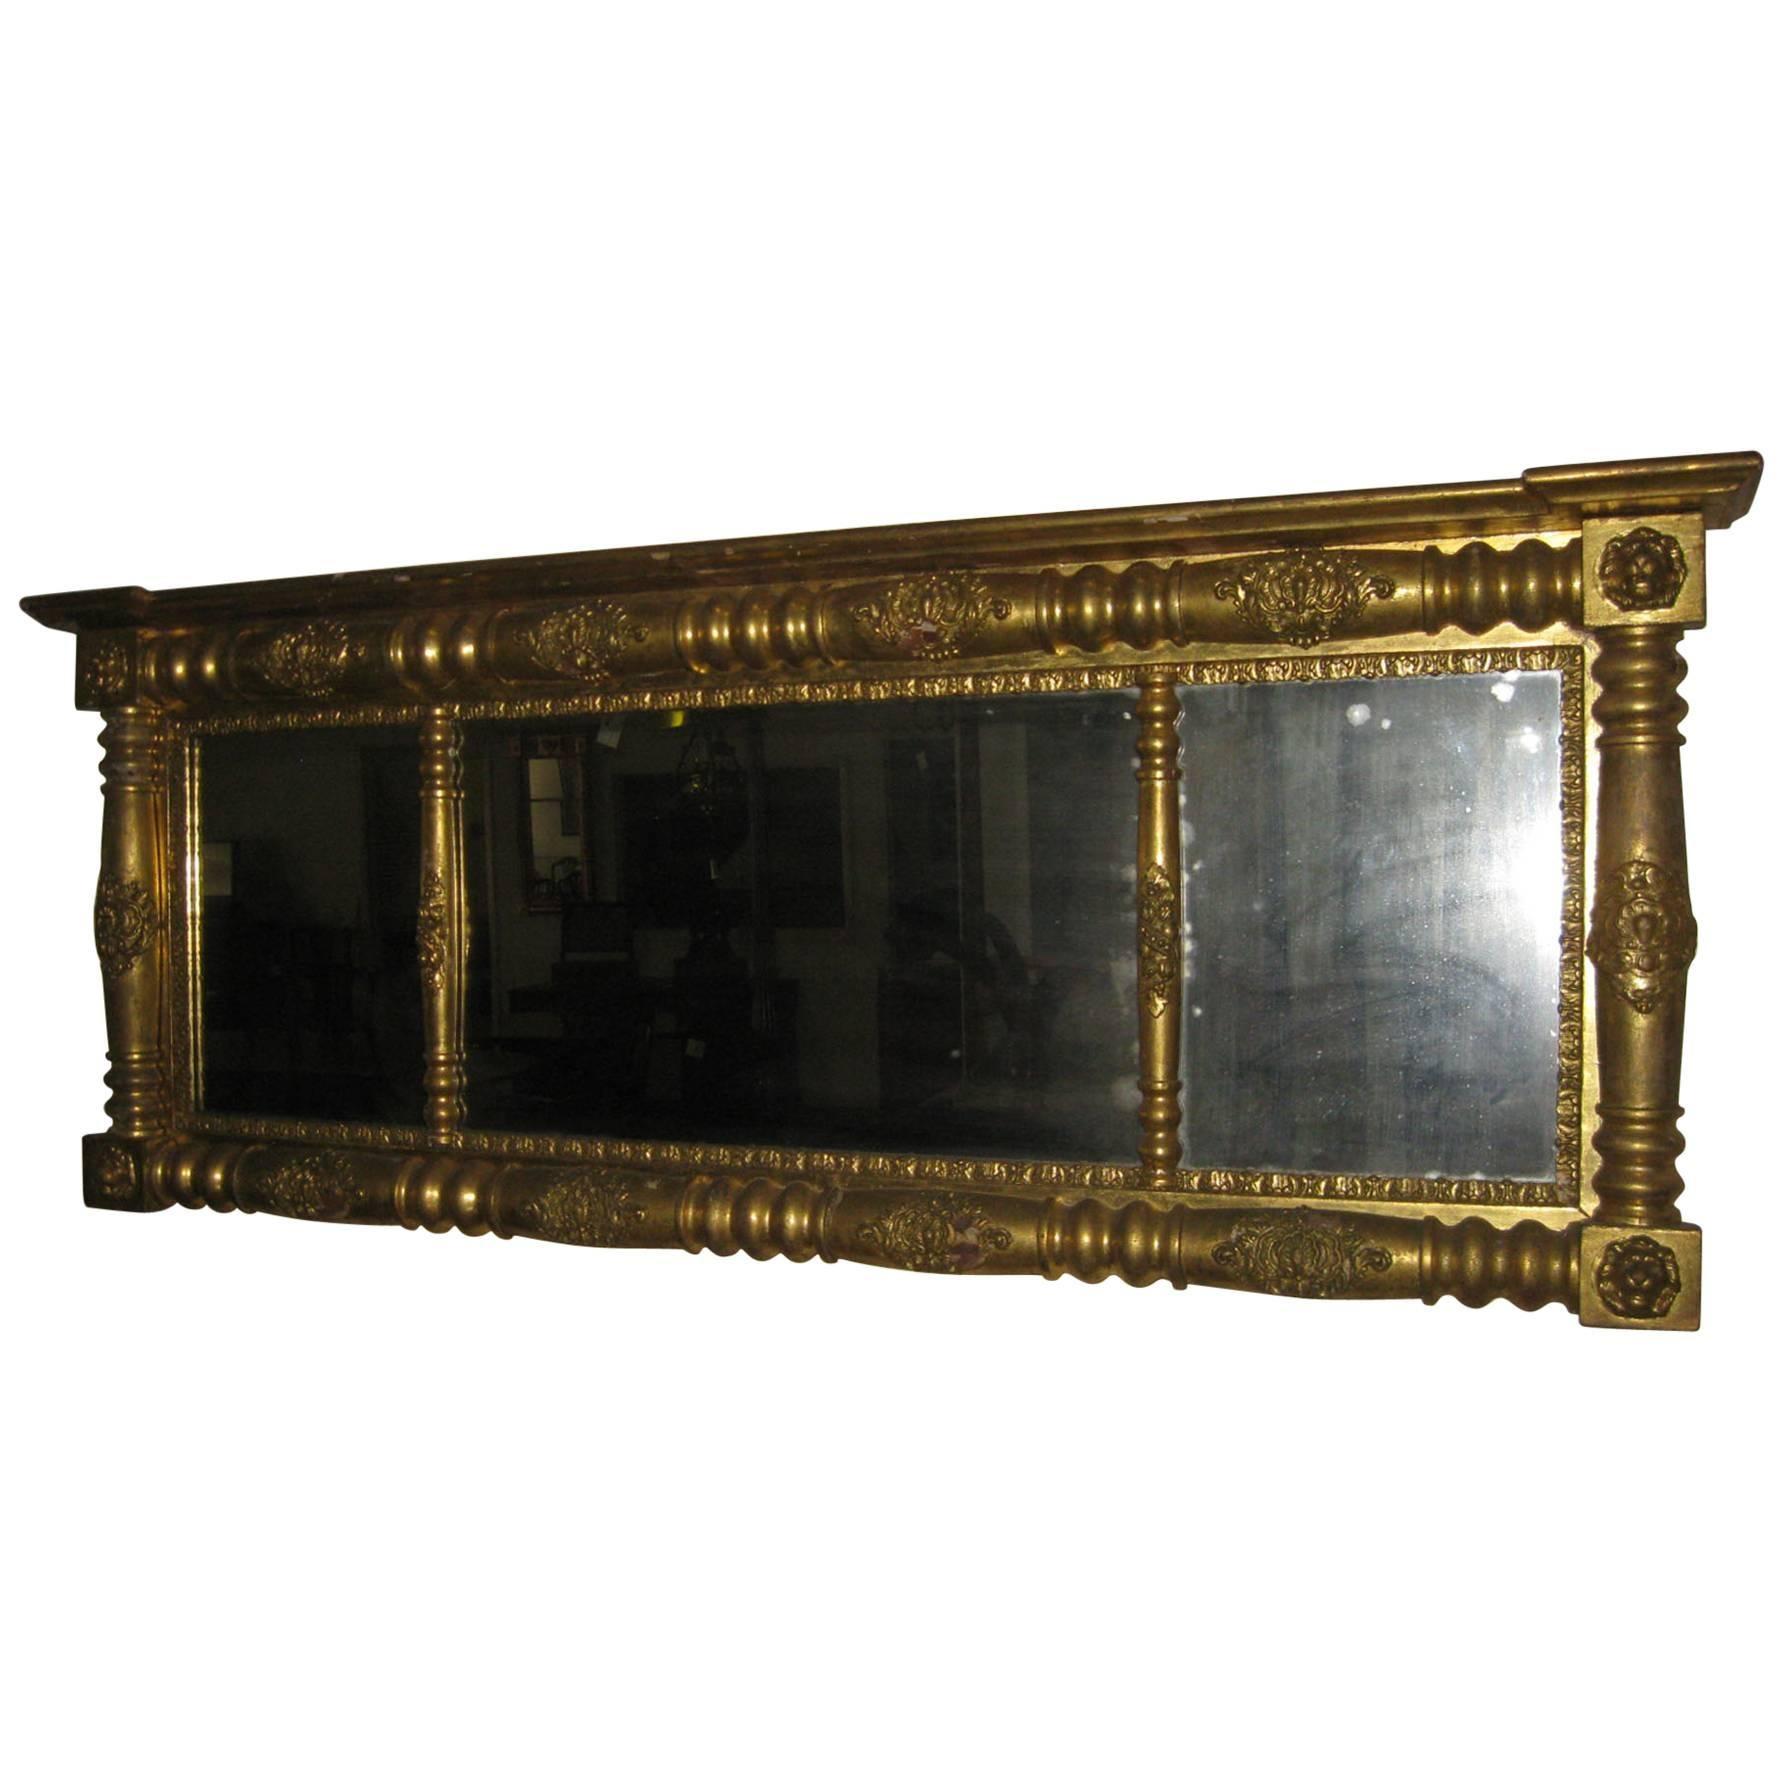 19th century Giltwood American Overmantel Mirror